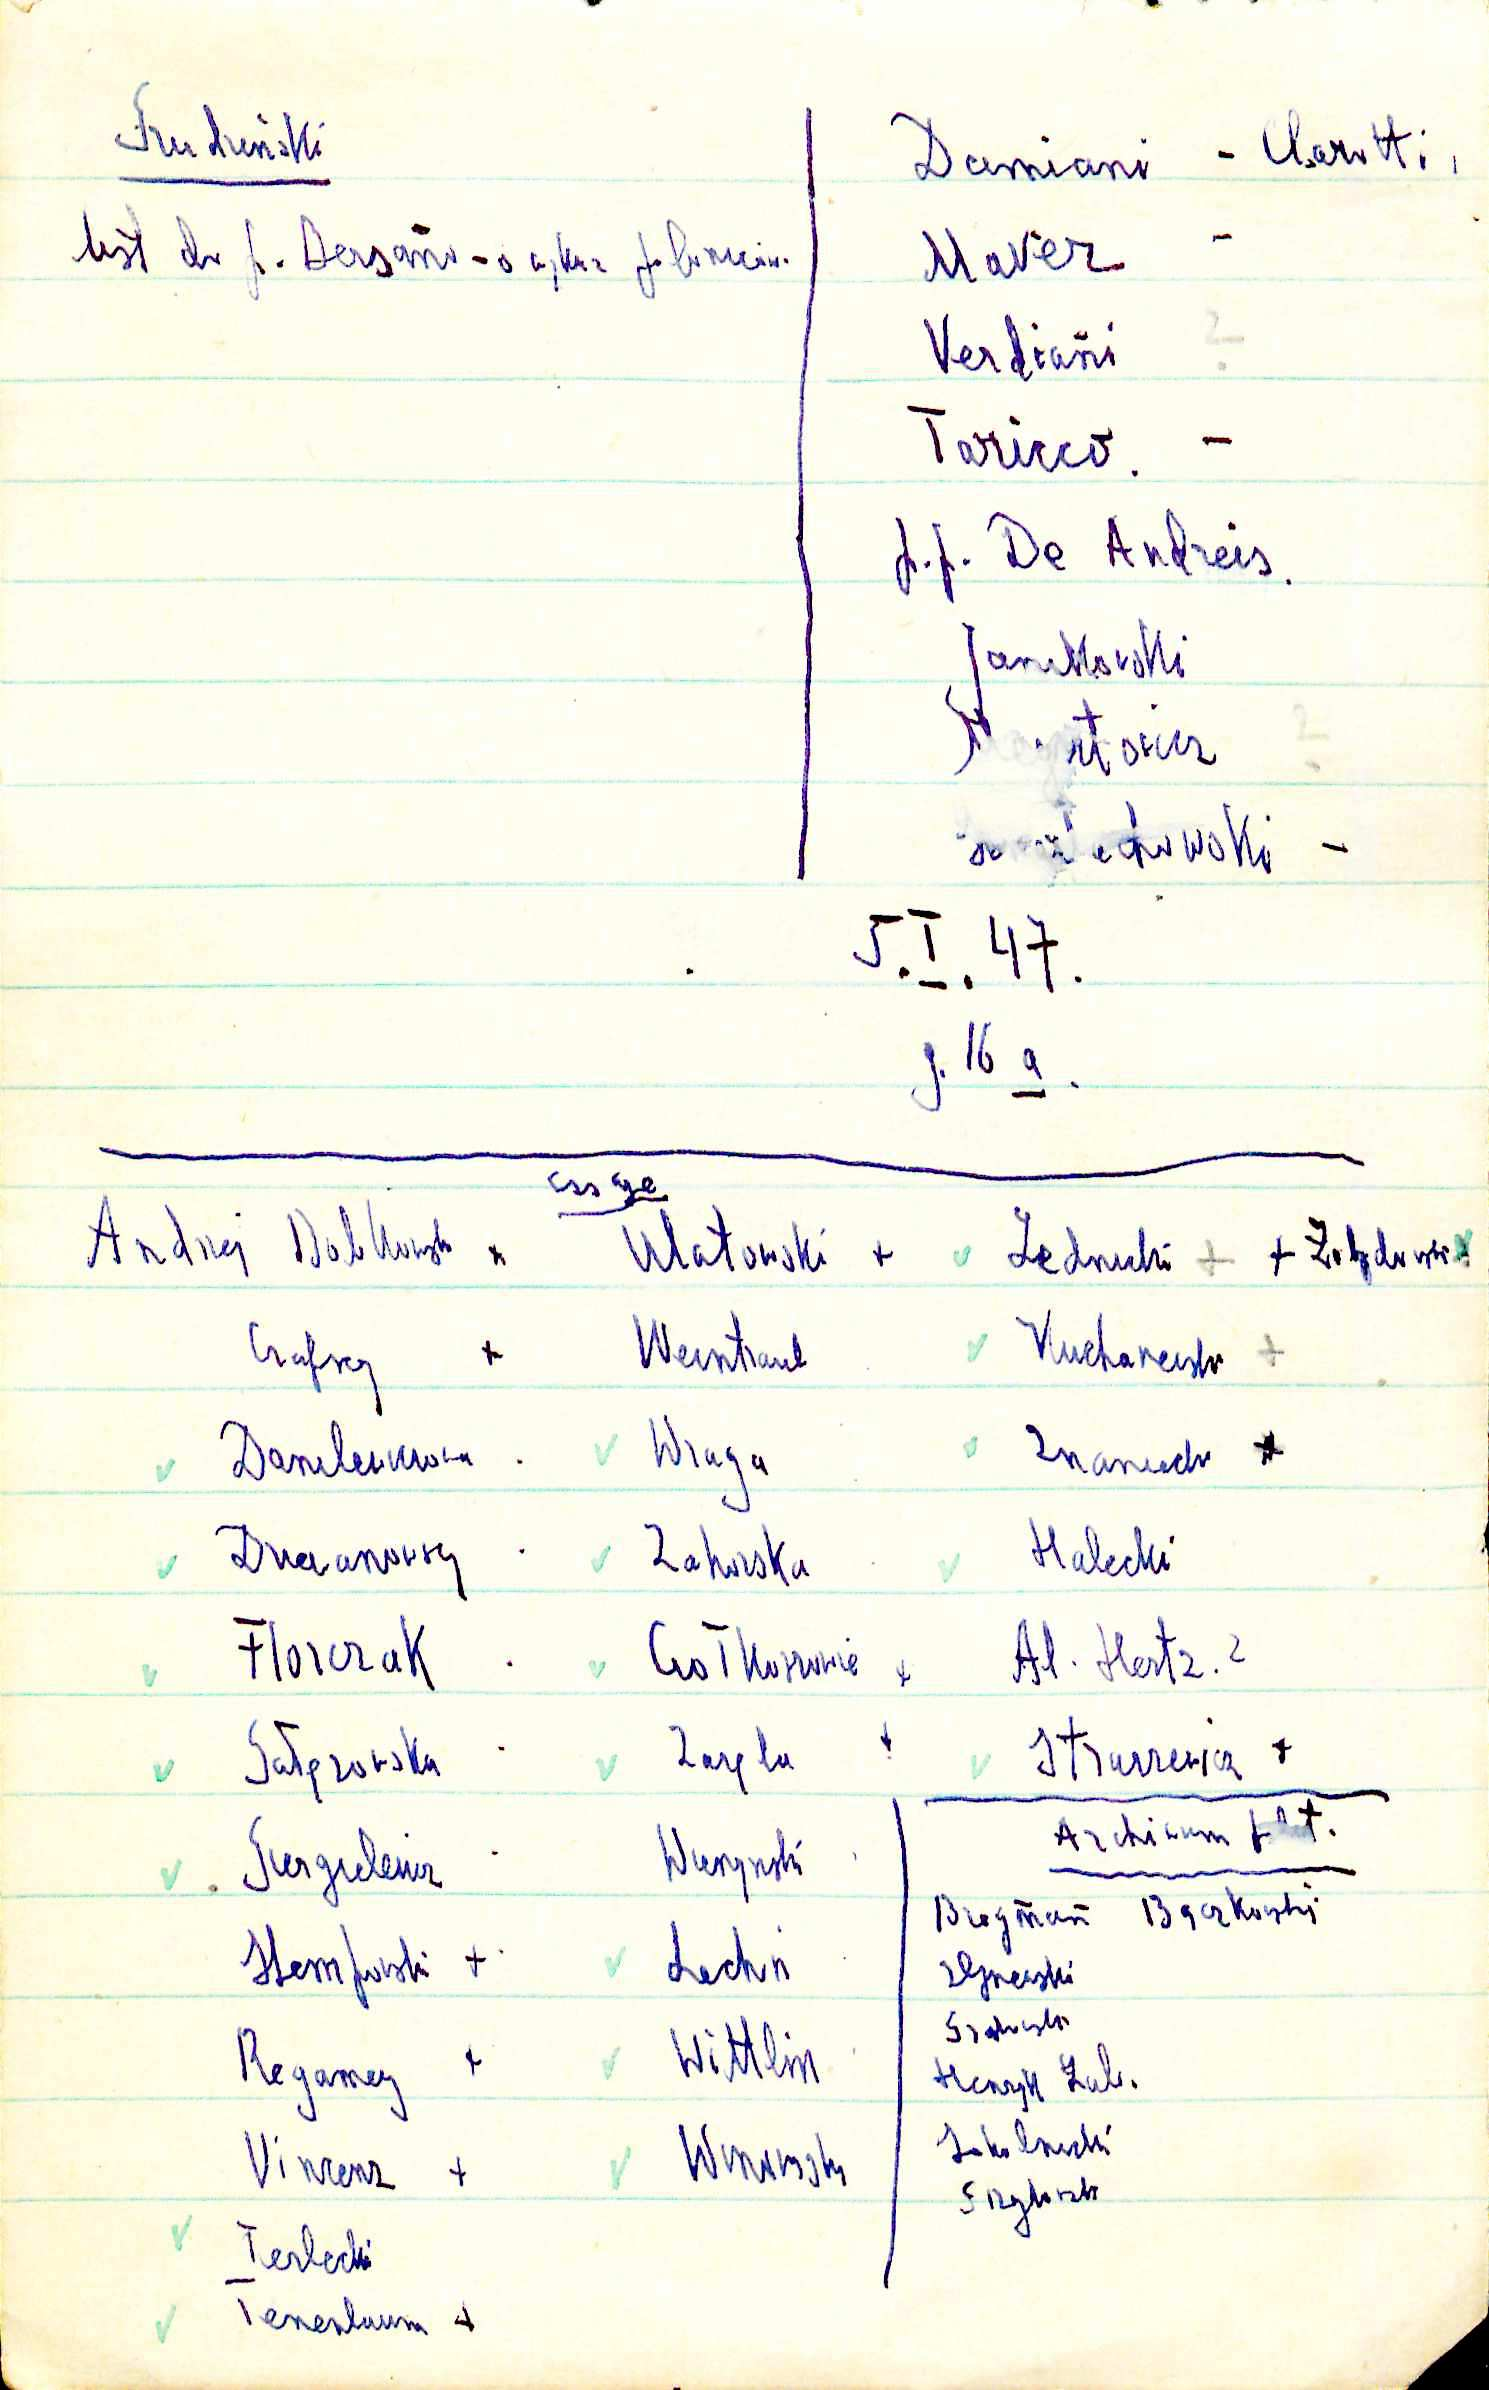 <div class='inner-box'><div class='close-desc'></div><span class='opis'>Reprint &ndash; luźne notatki z papier&oacute;w osobistych Jerzego Giedroycia, syg. PoJG 03.02</span><div class='clearfix'></div><span>Sygn. reprint2</span><div class='clearfix'></div><span>&copy; Instytut Literacki</span></div>